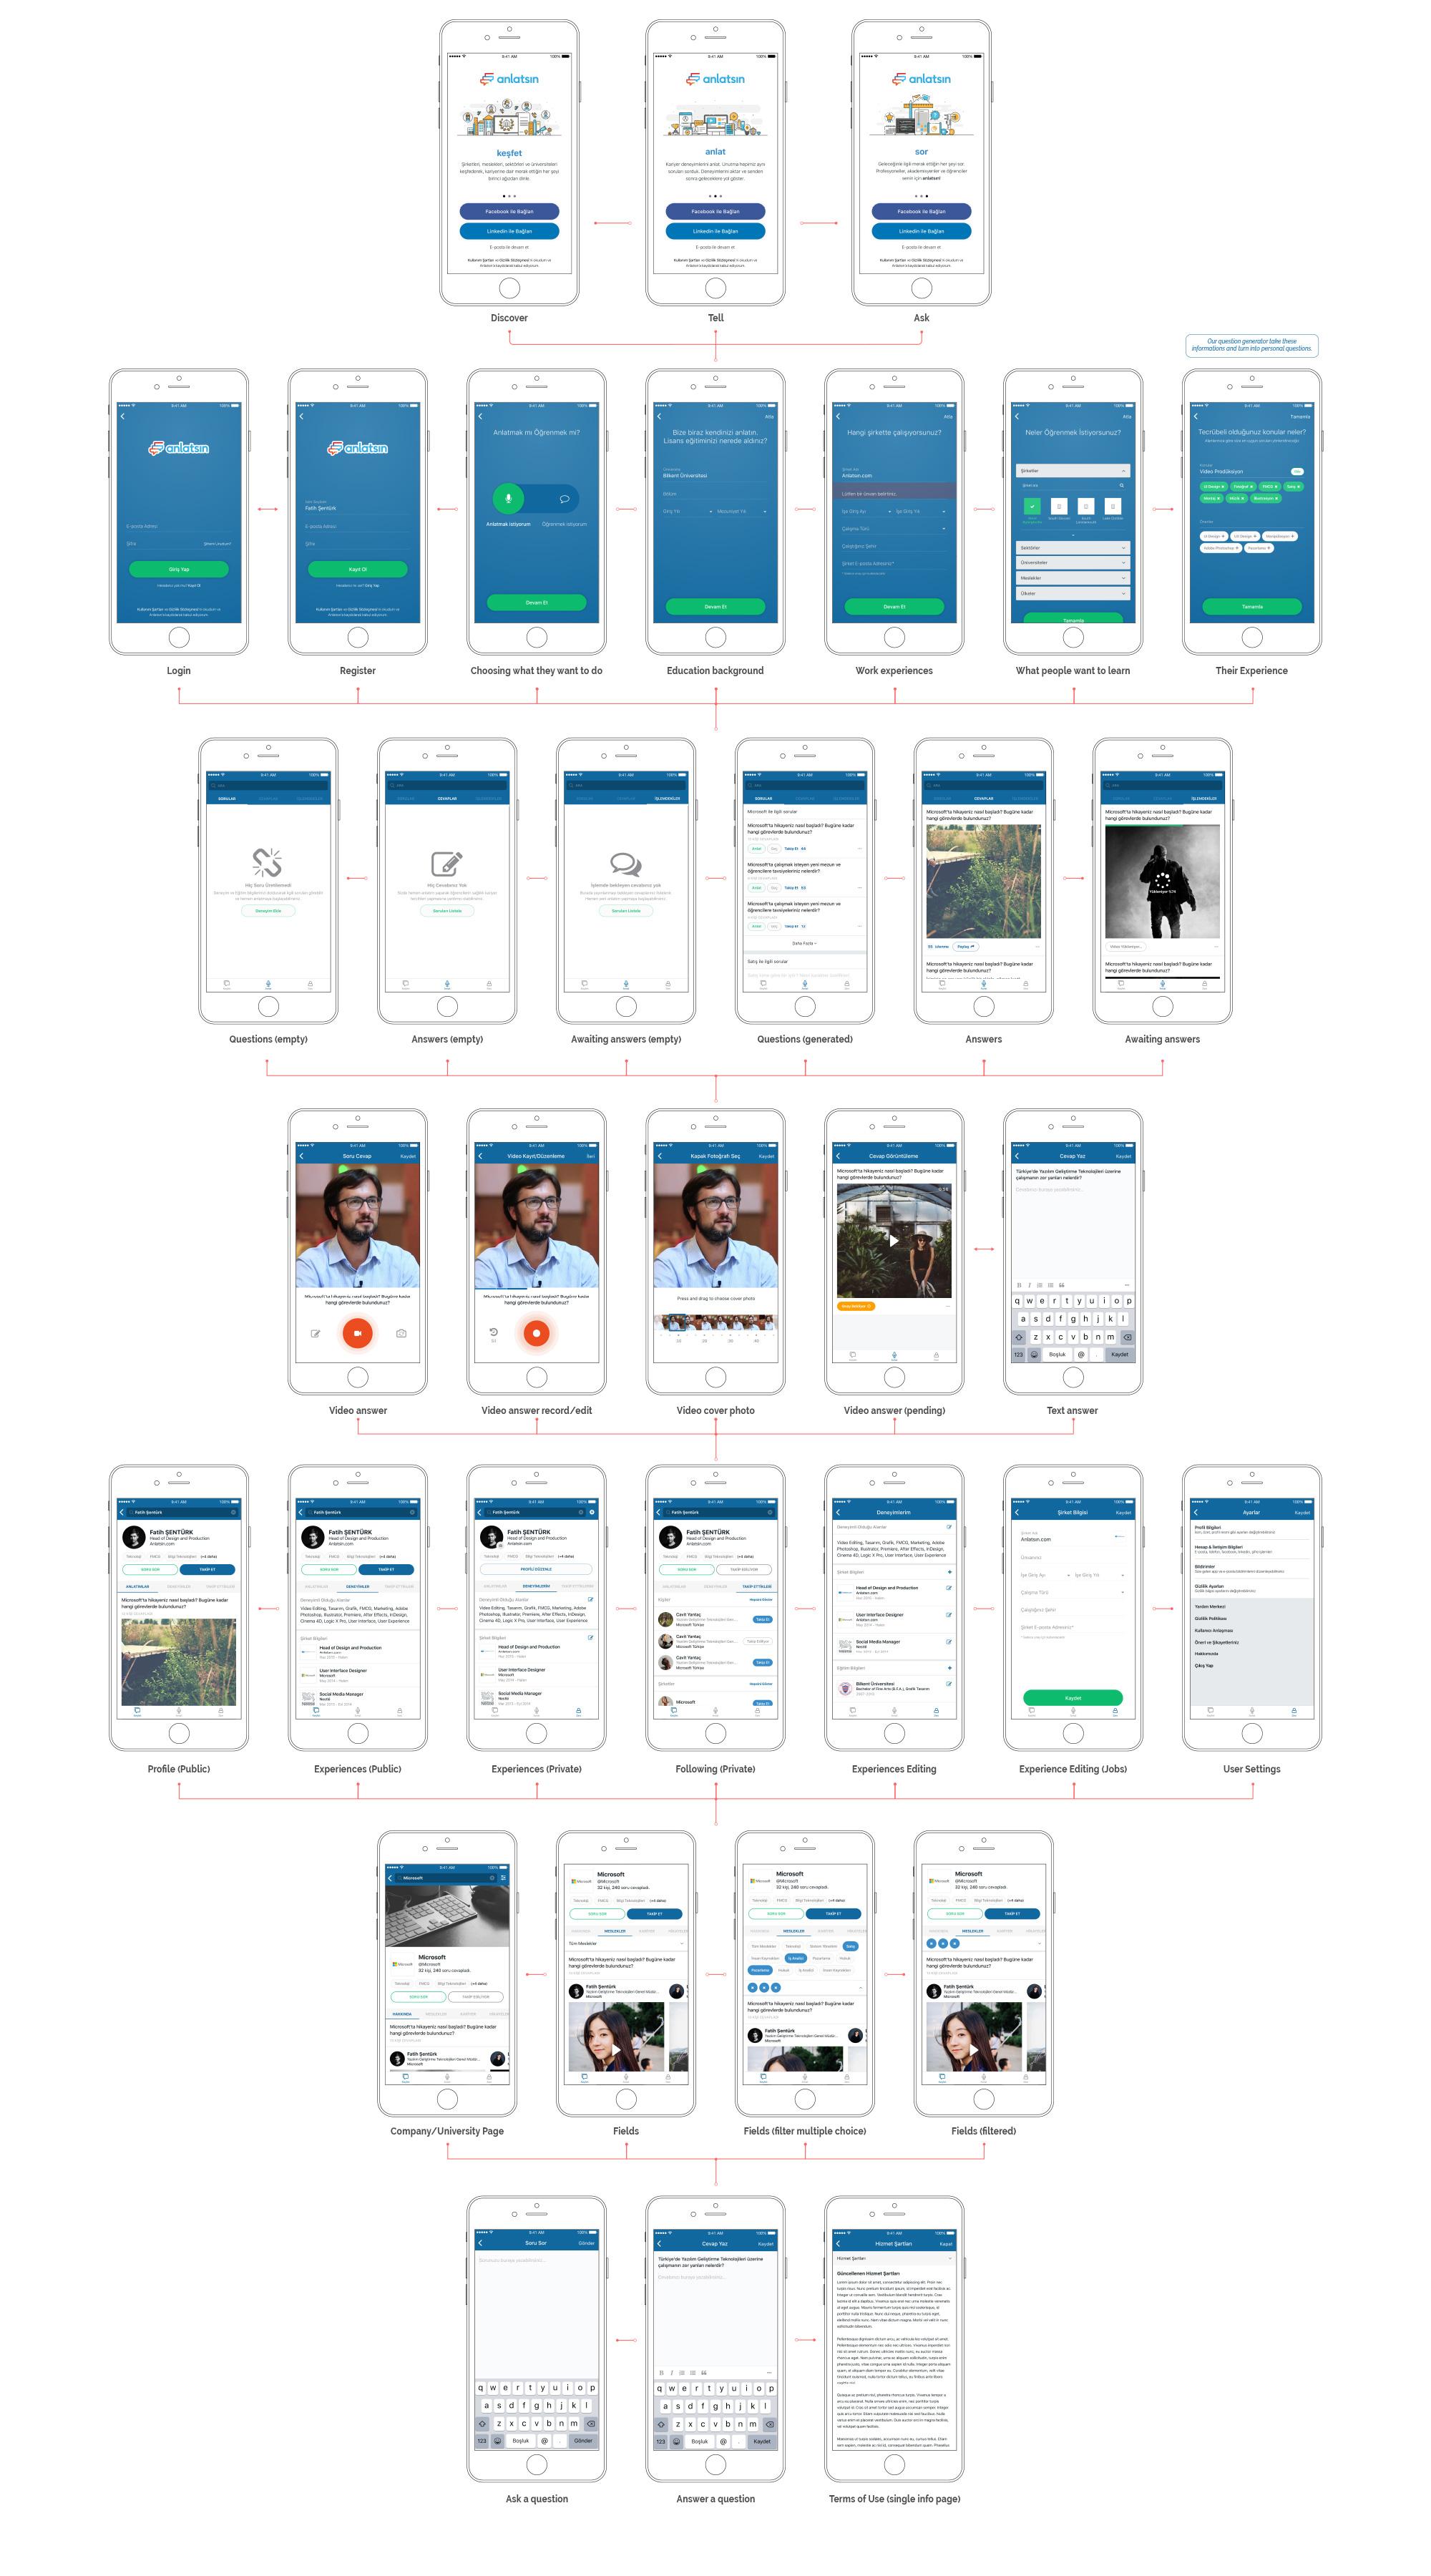 anlatsin-app-ui-ux-content-04-wireframe